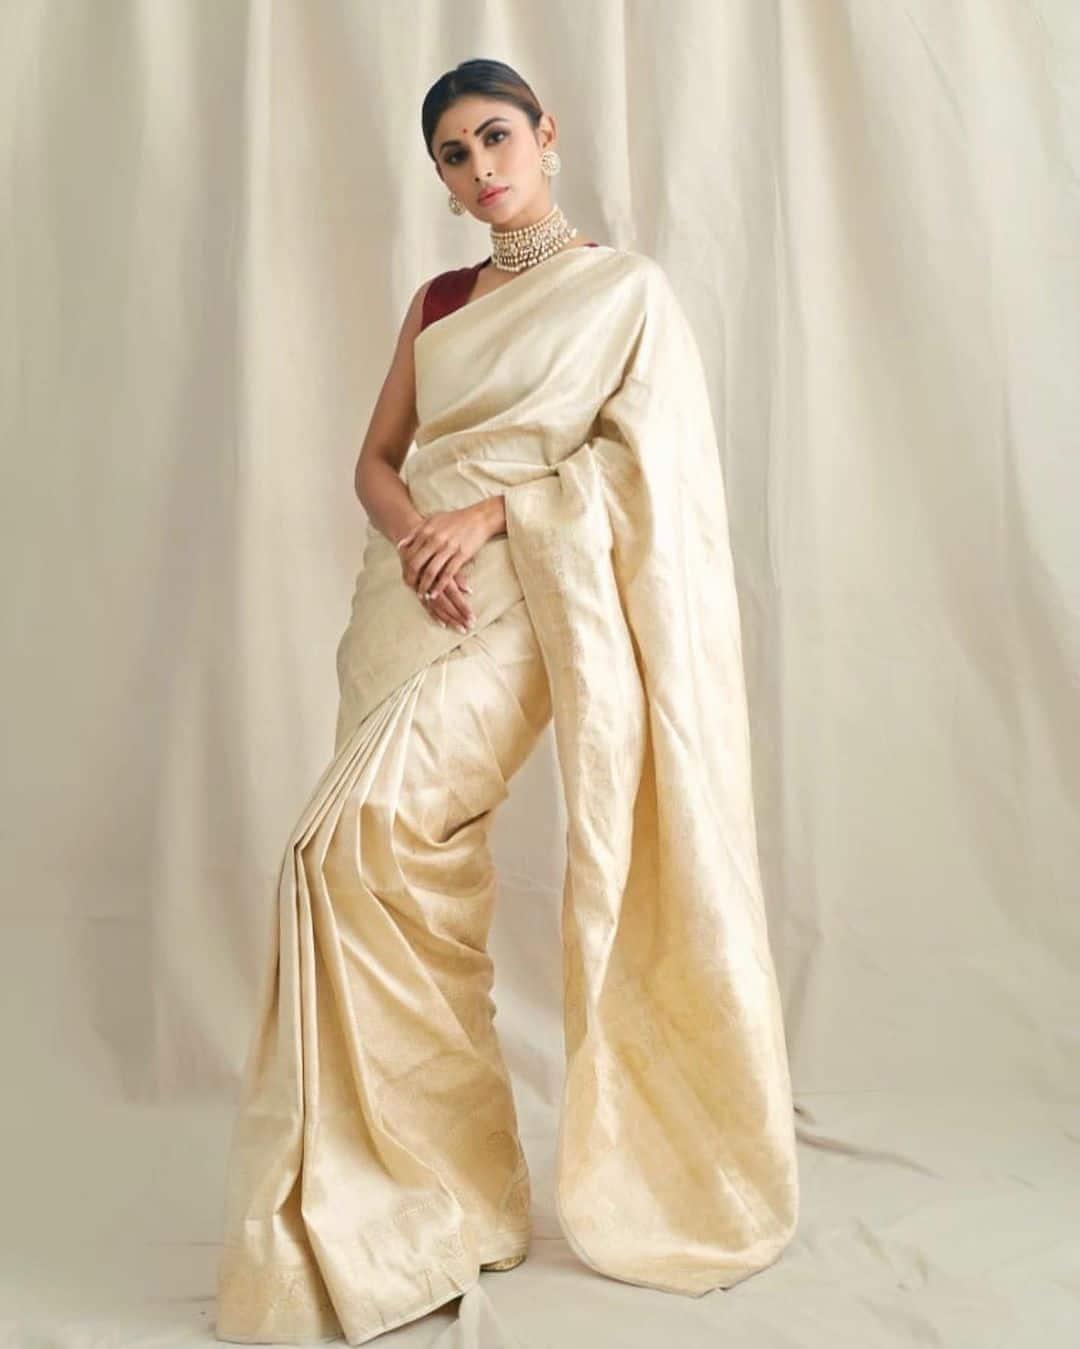 Mouni looks regal in white silk saree